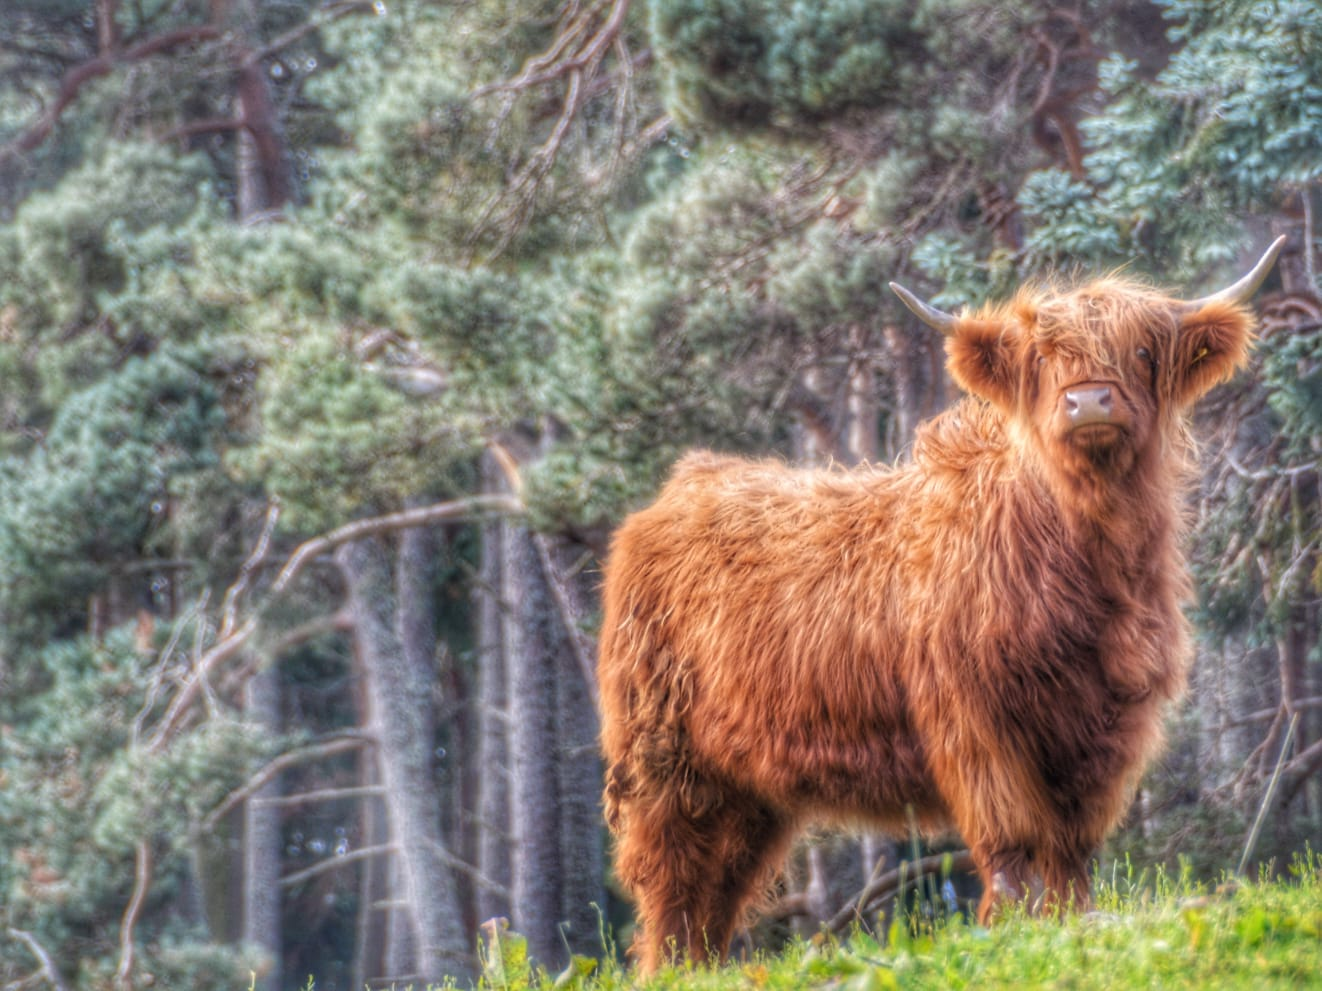 Little Fluffy Highland Cow, Highlands, Scotland